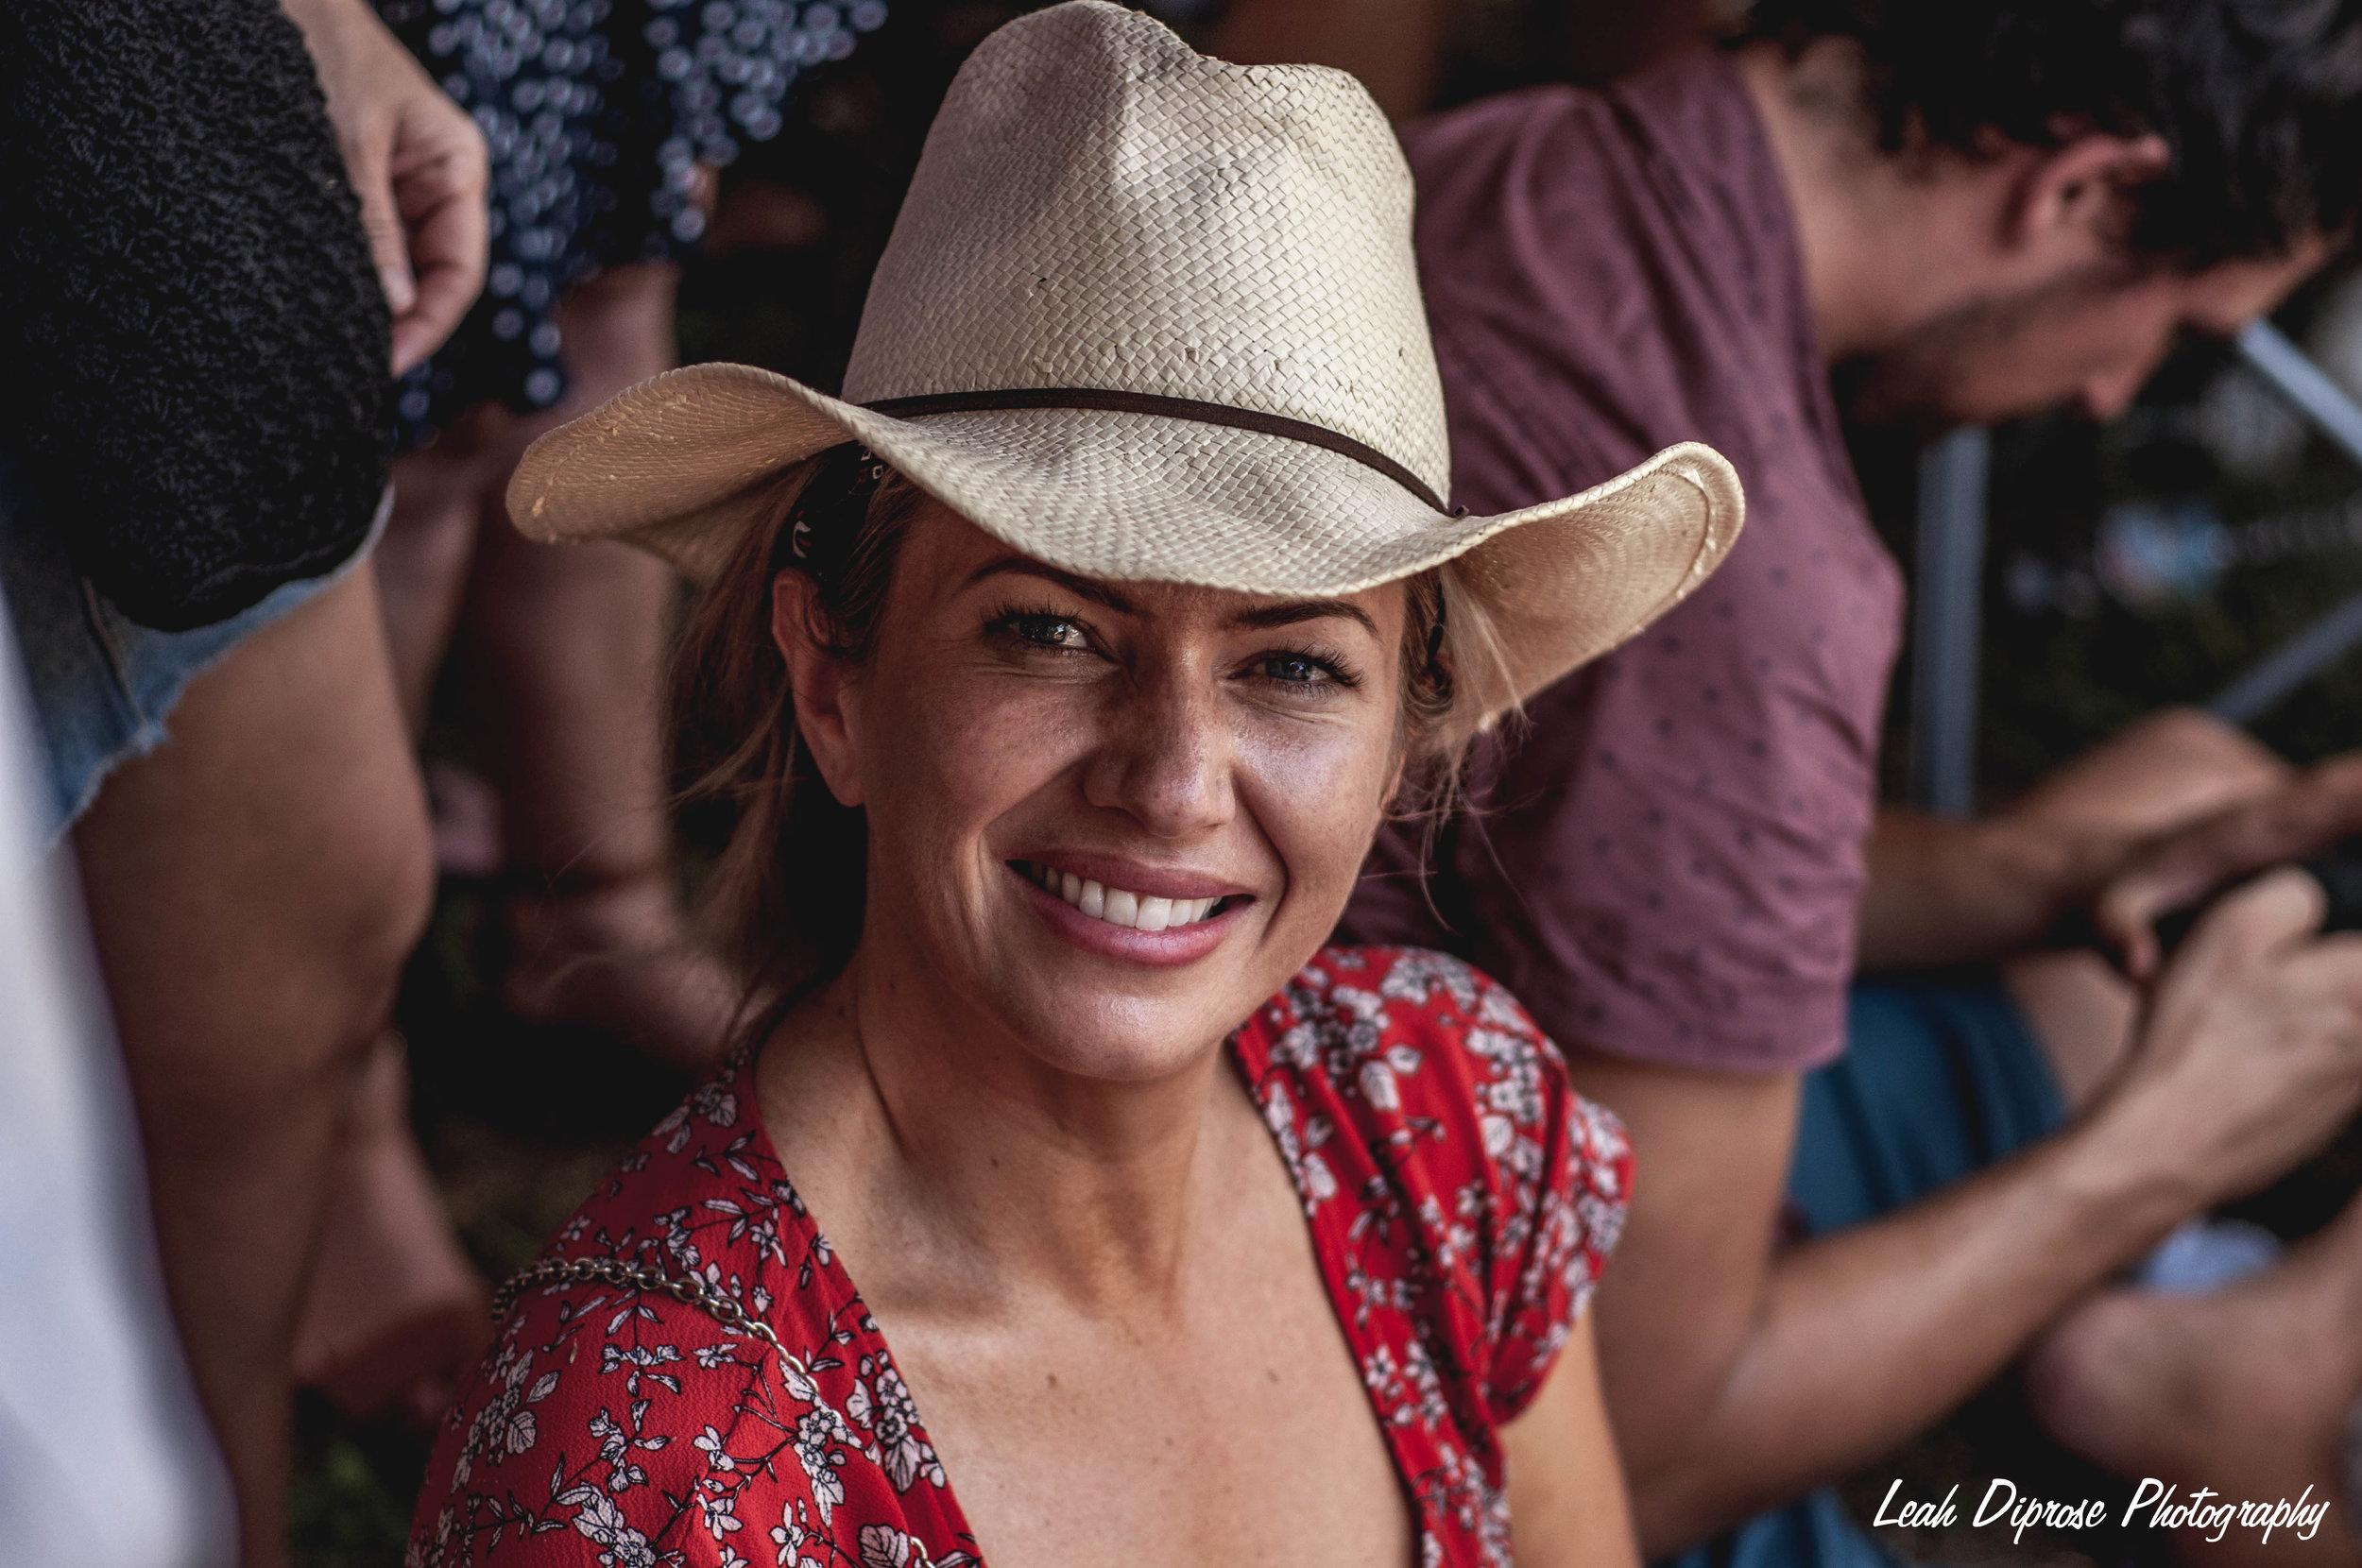 Leah Diprose Photography image-6416.jpg